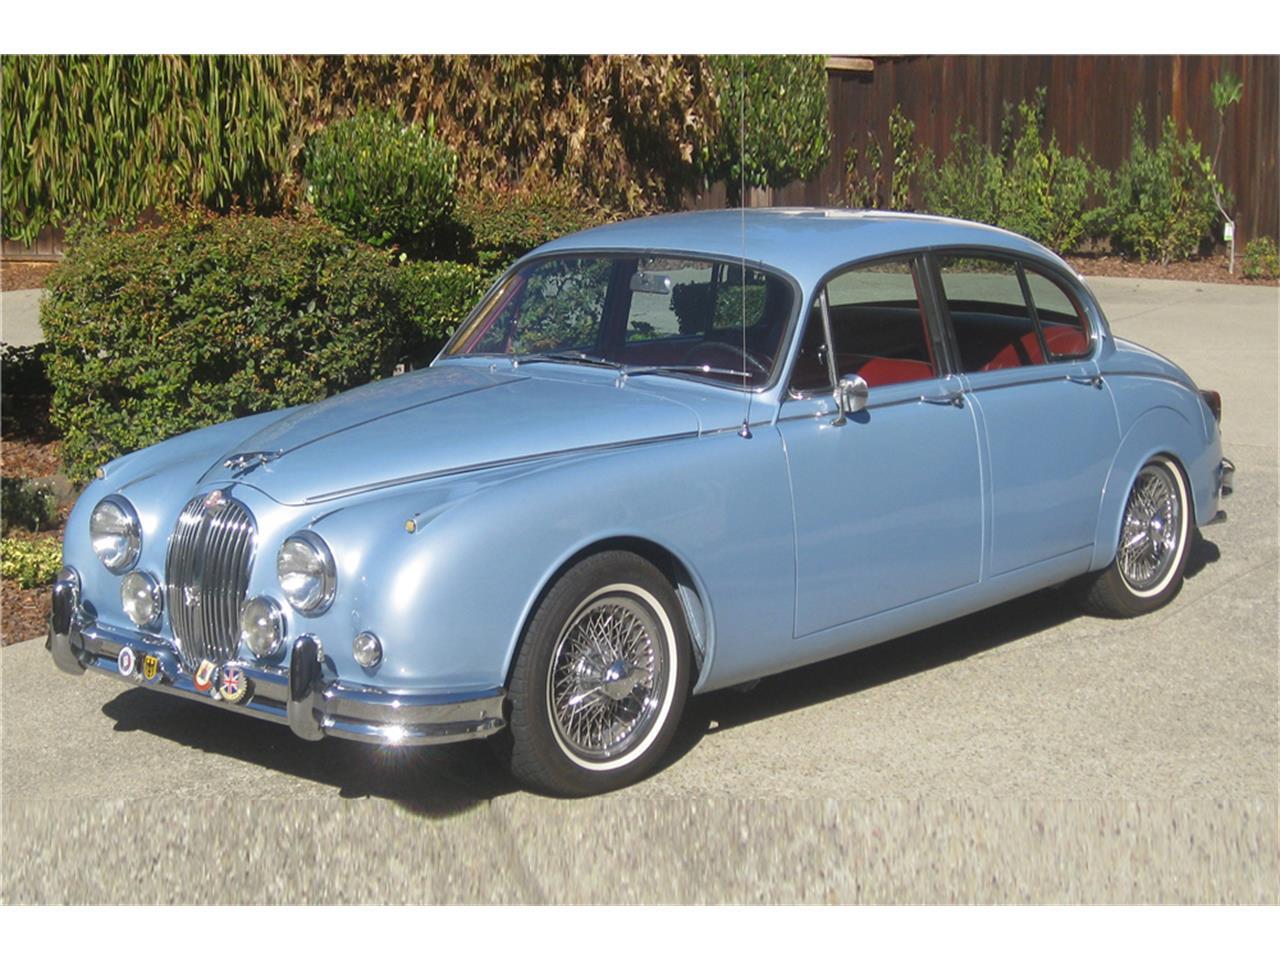 1964 Jaguar Mark II for Sale | ClassicCars.com | CC-1055019